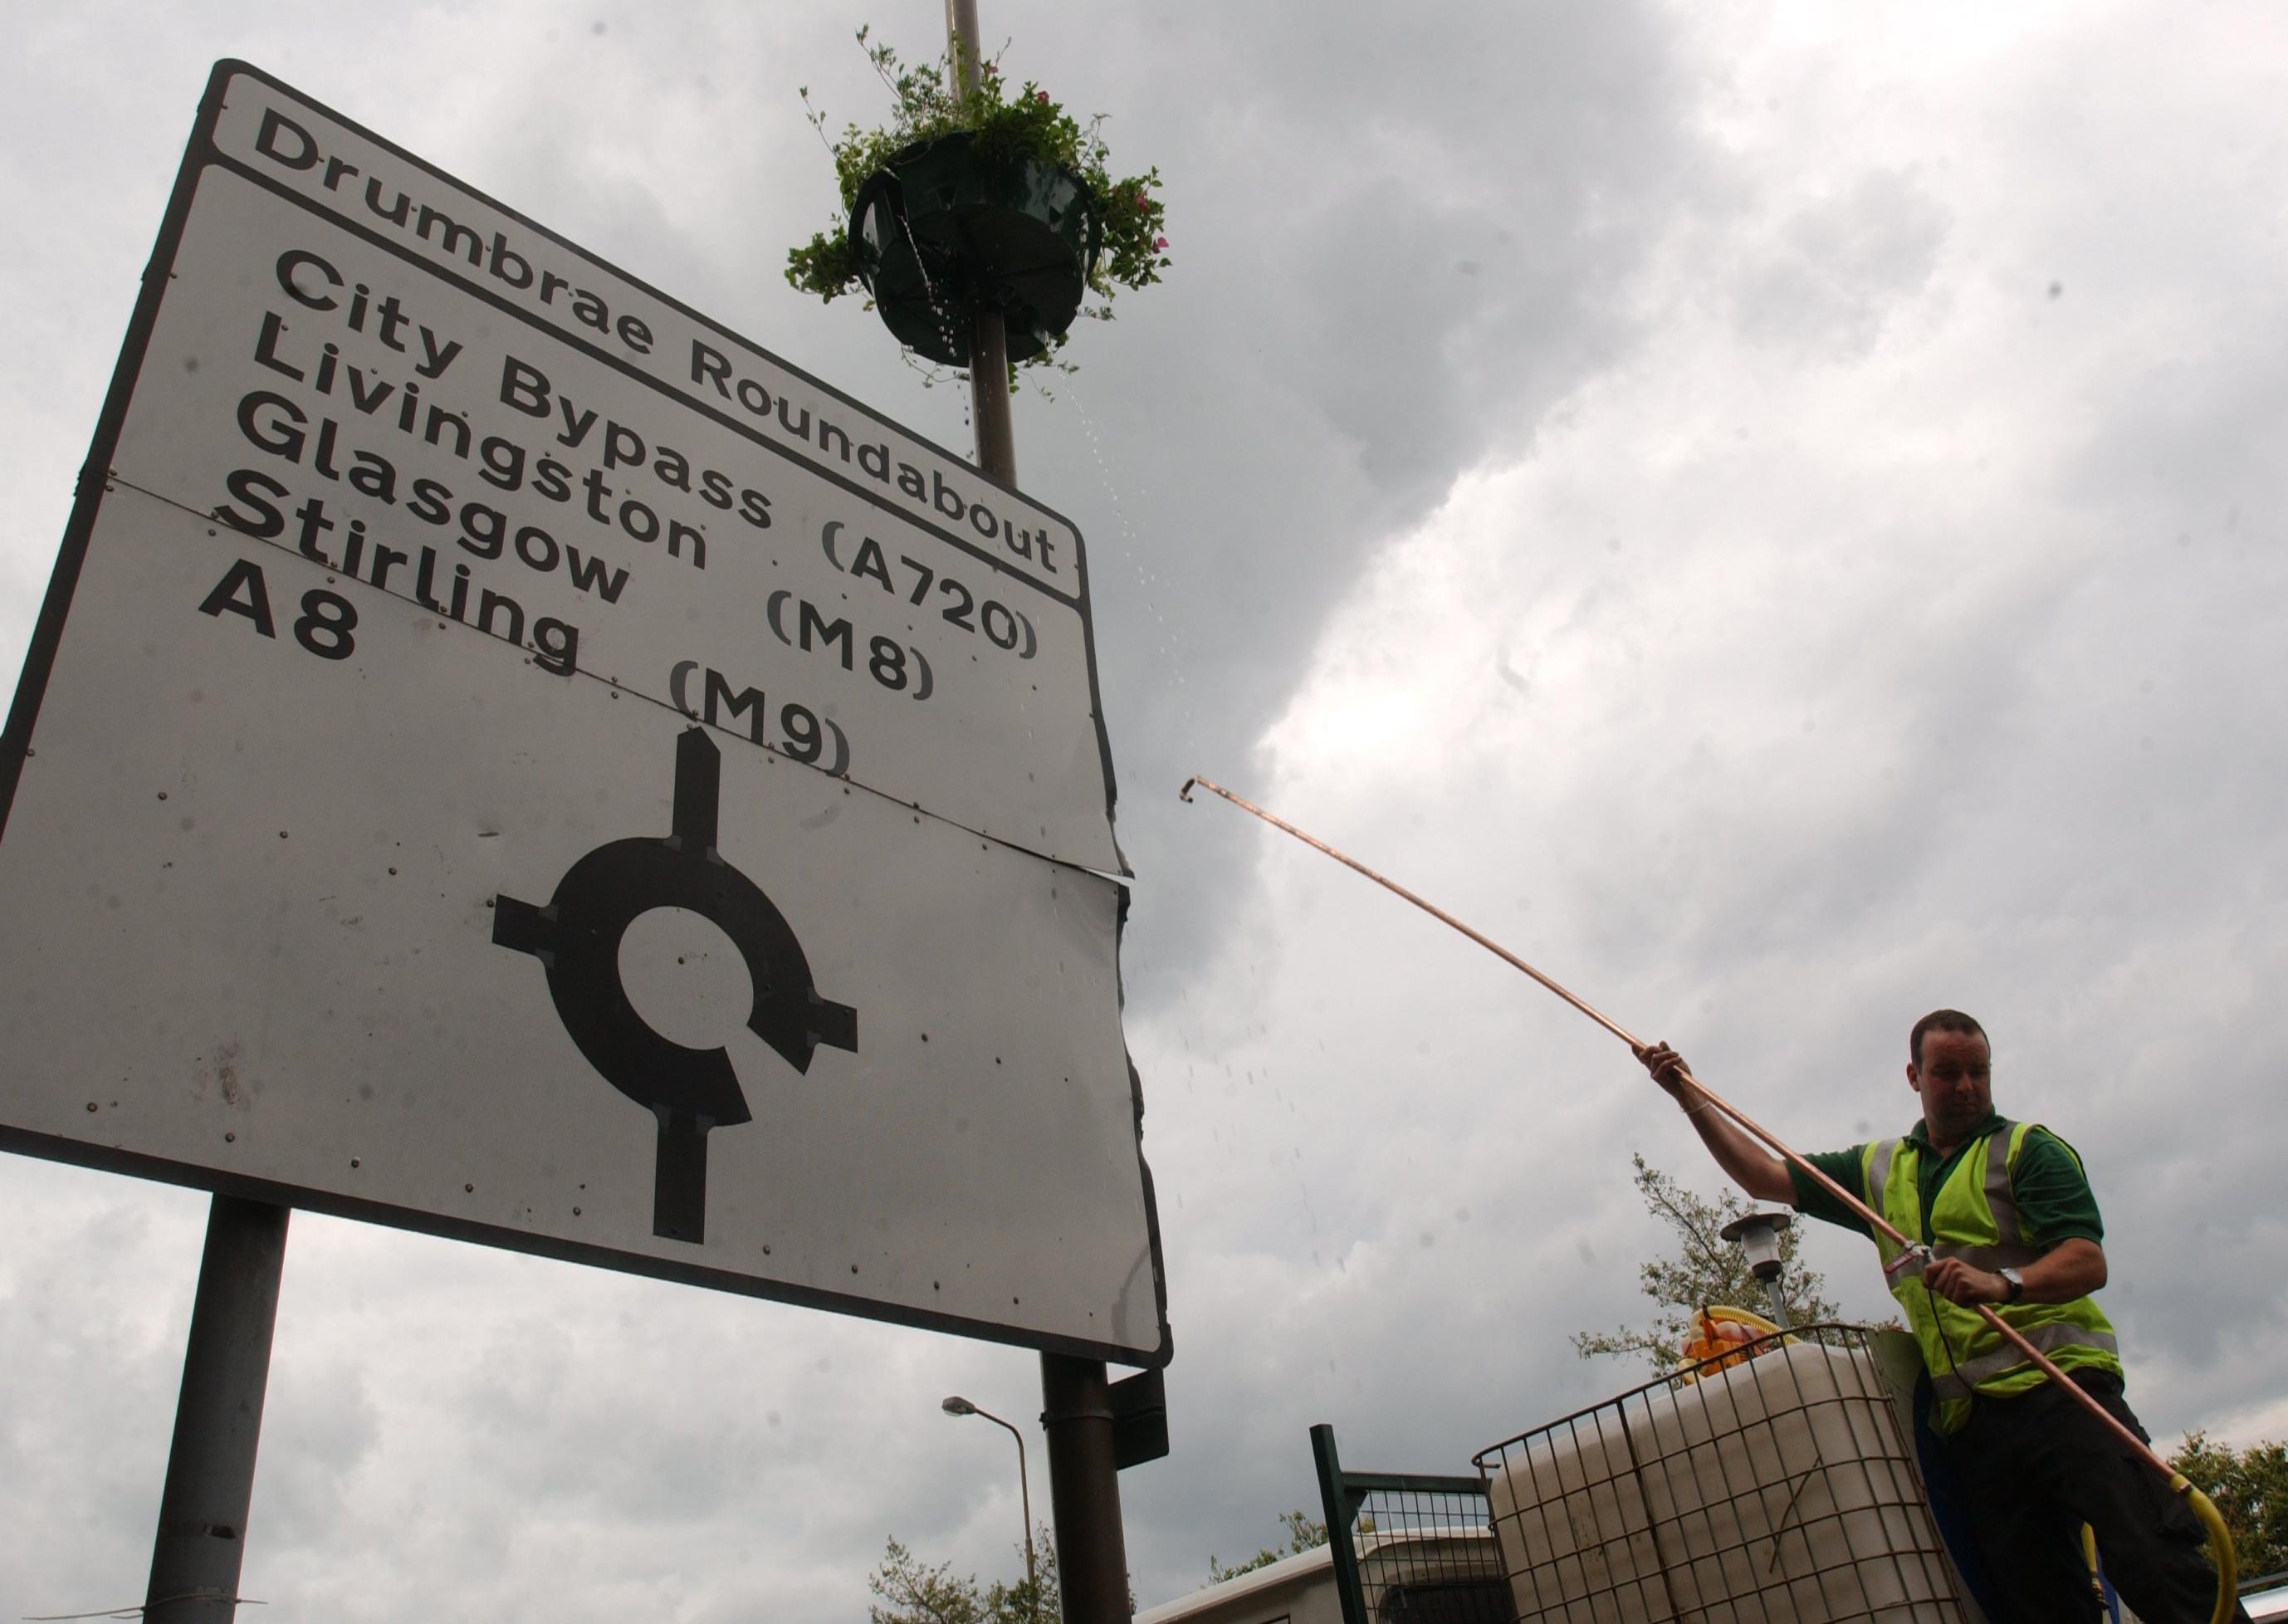 Is part of Edinburgh to be virtually sealed off? – Robert Aldridge